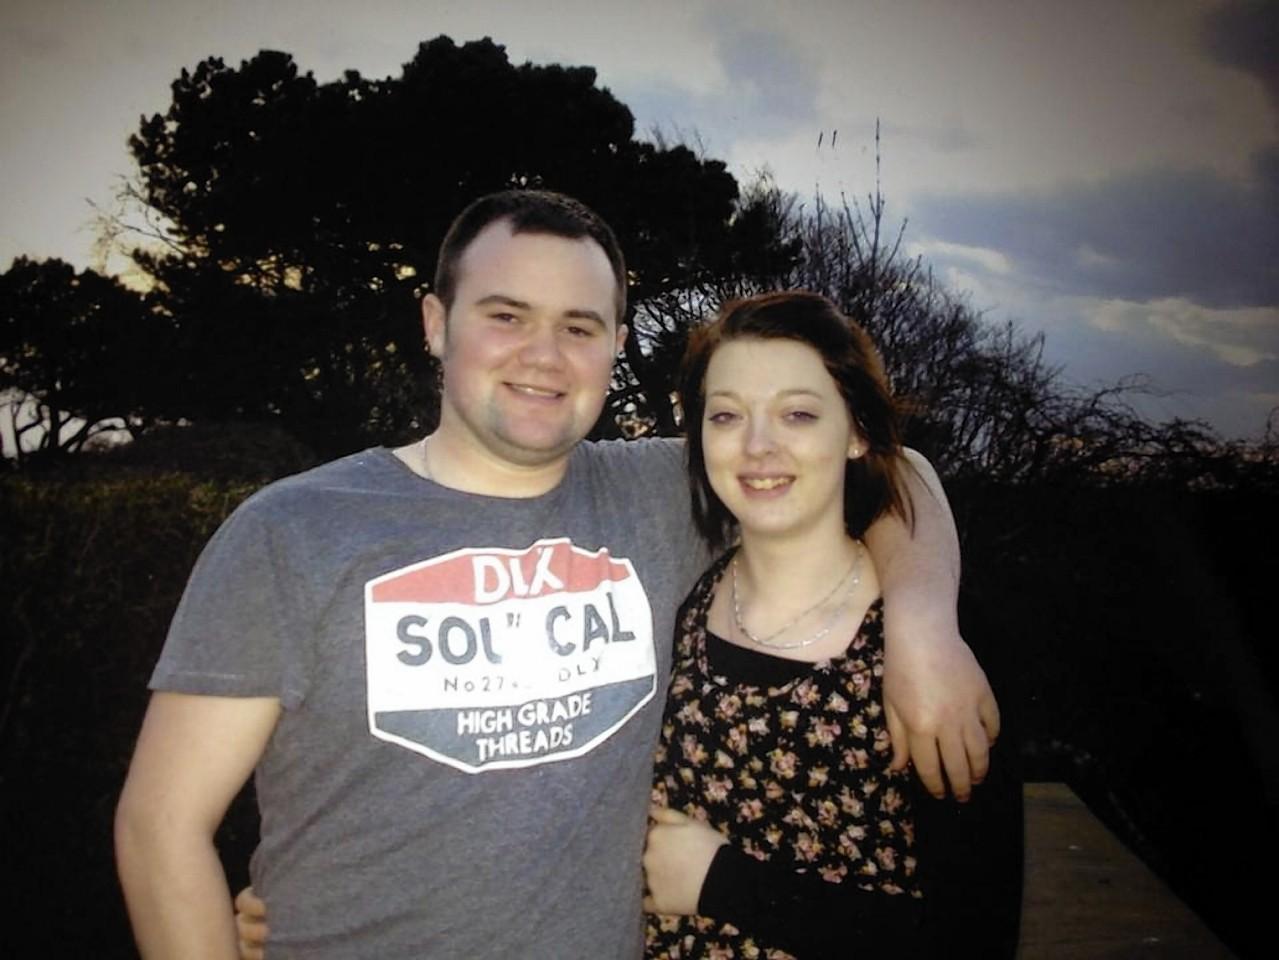 Grant Morrison and Gemma Davidson